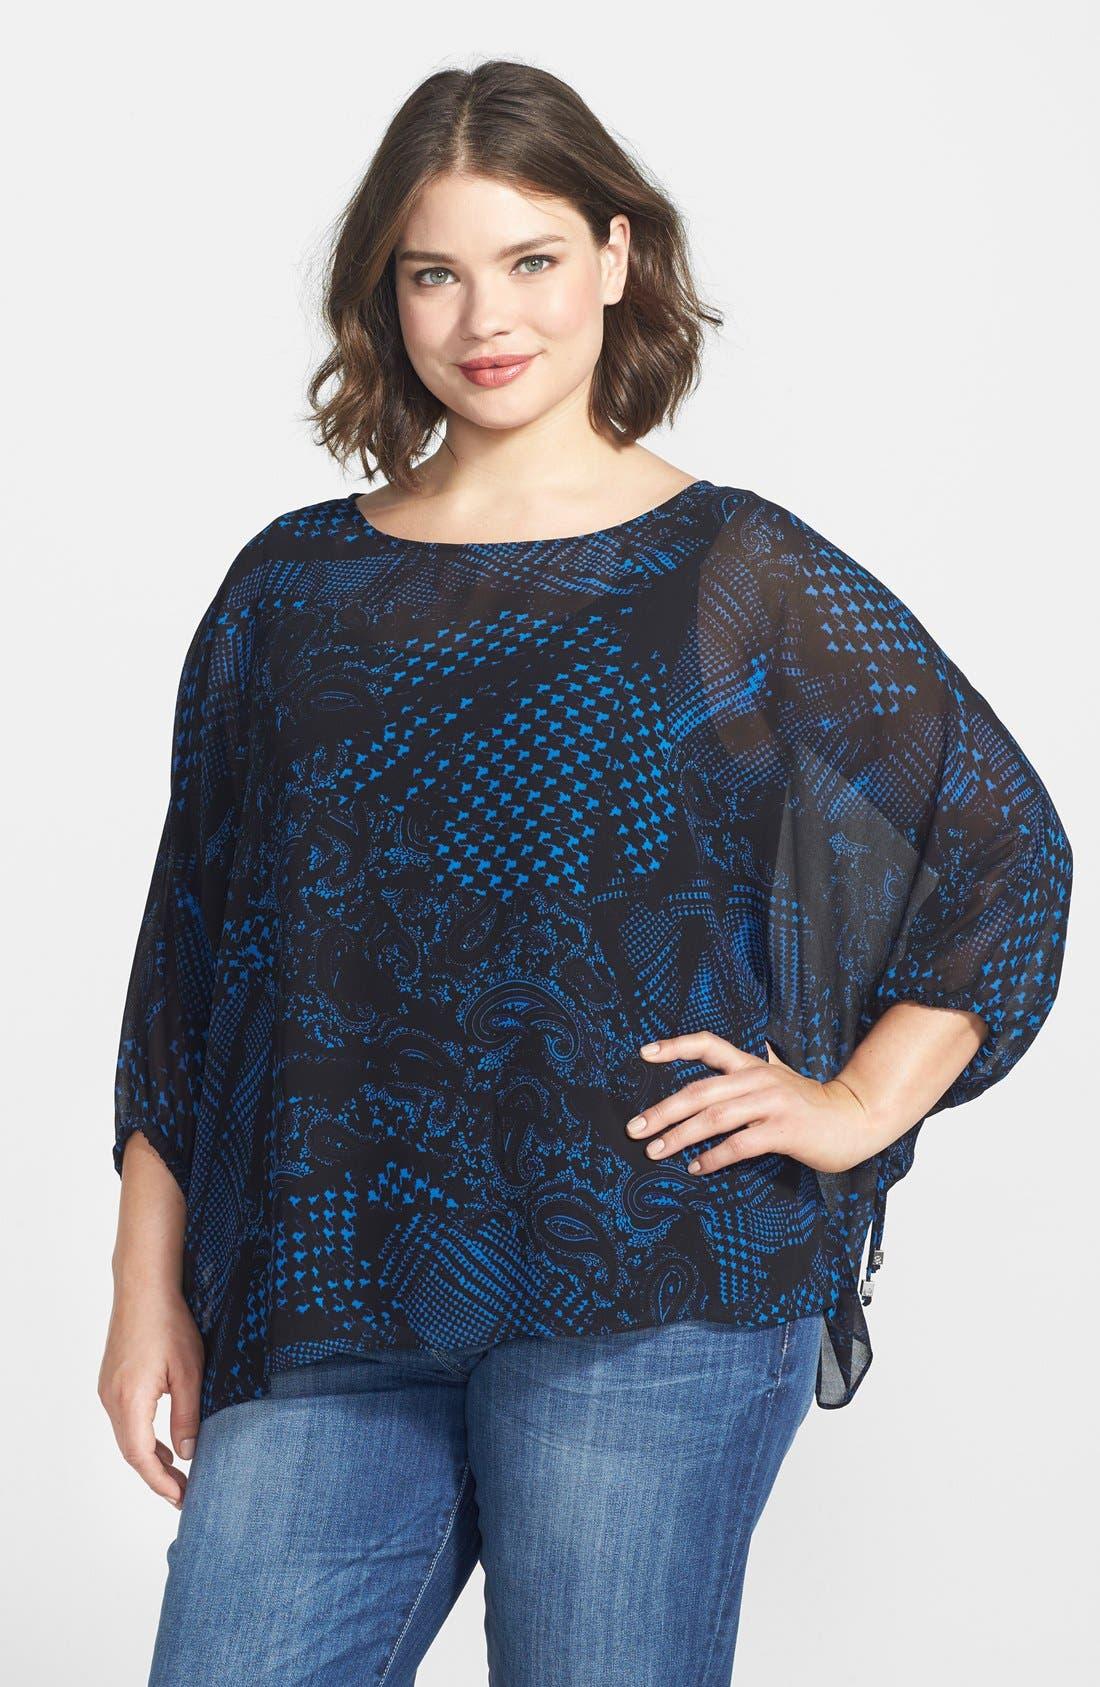 Alternate Image 1 Selected - MICHAEL Michael Kors Foulard Print Kimono Sleeve Top (Plus Size)